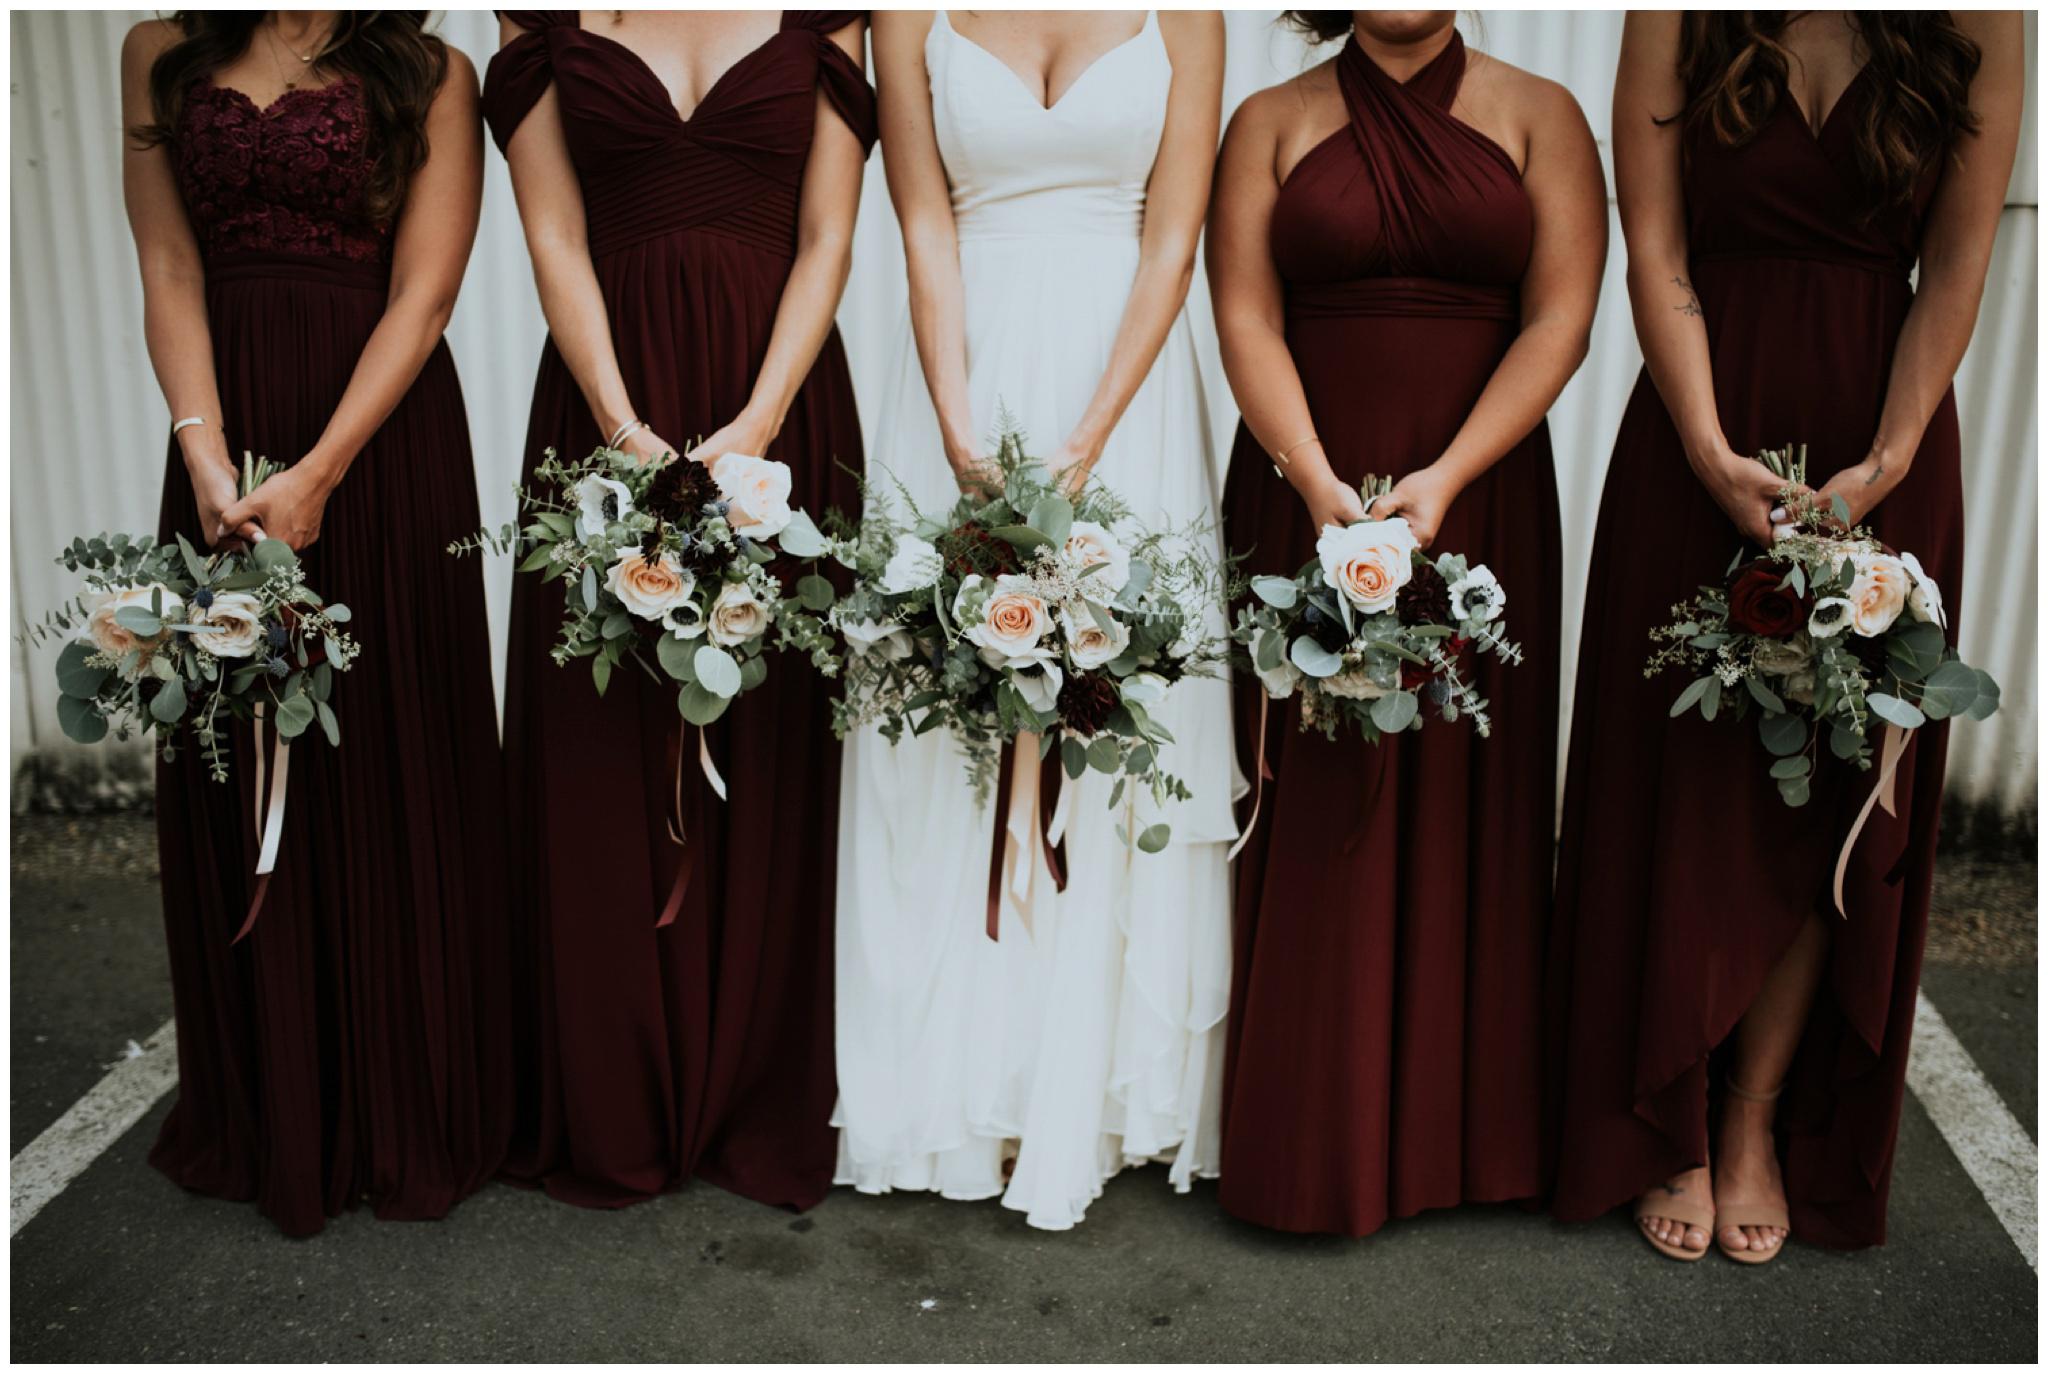 alyssa-keiran-westland-distillery-urban-seattle-wedding-photographer-caitlyn-nikula-85.jpg